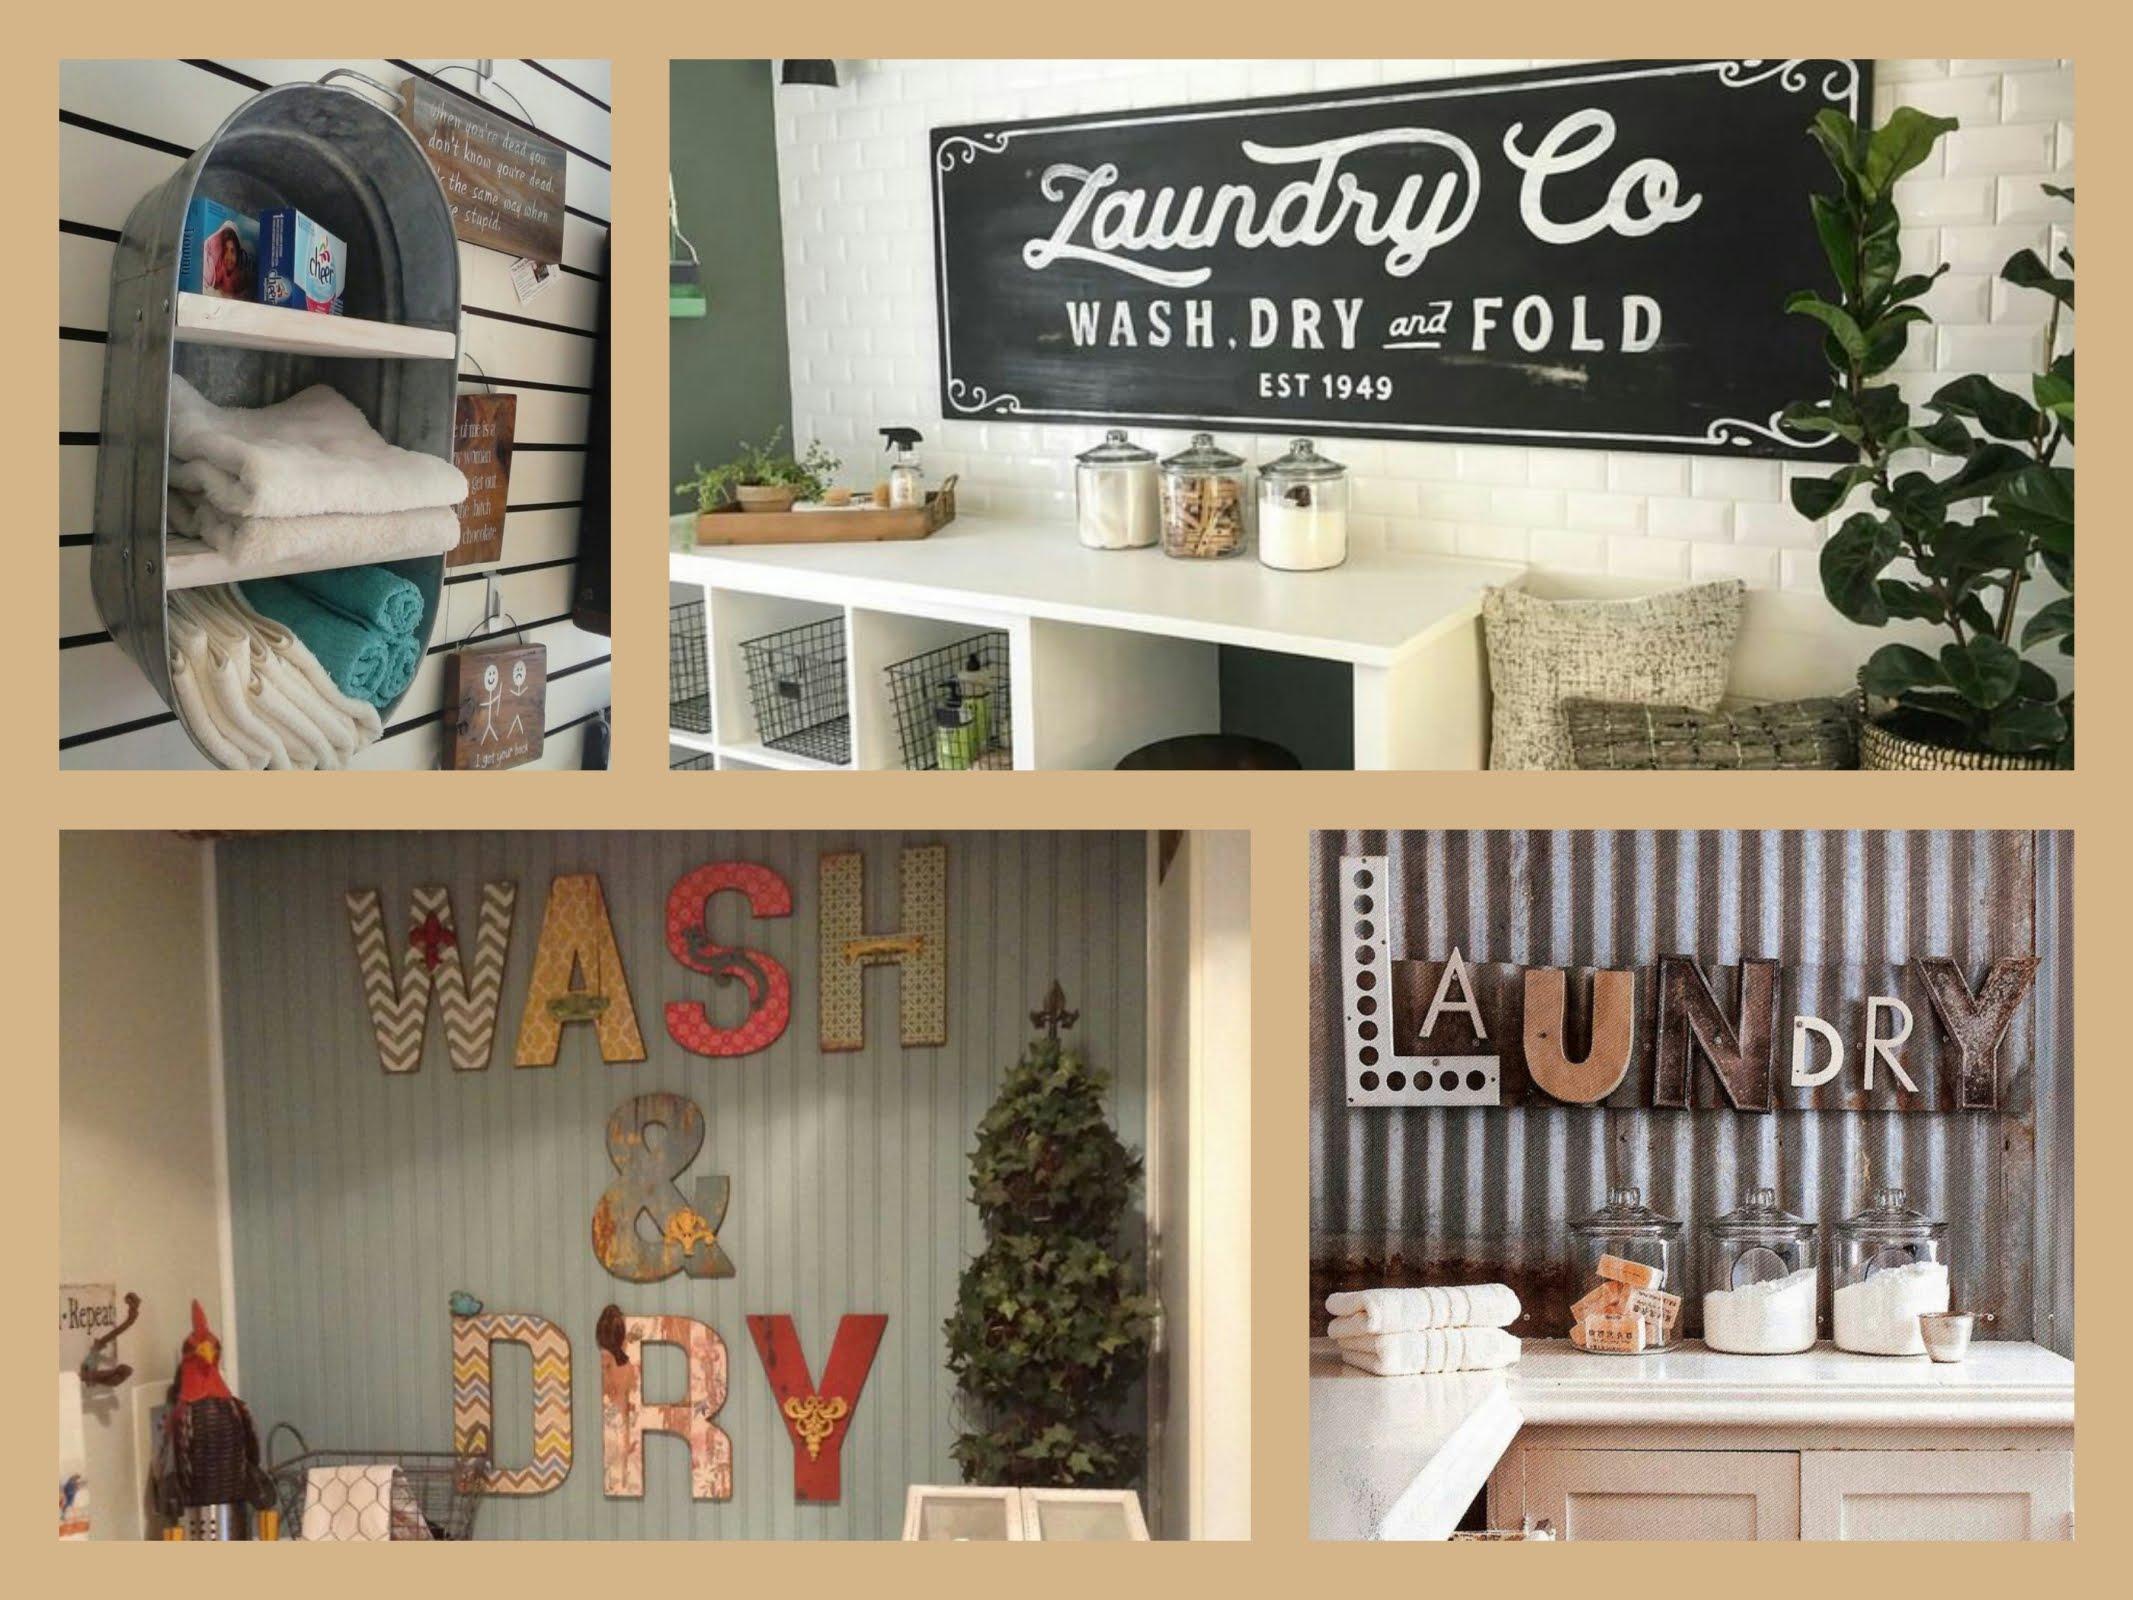 laundry room decor ideas - diy home decorations - youtube XMEXHRE